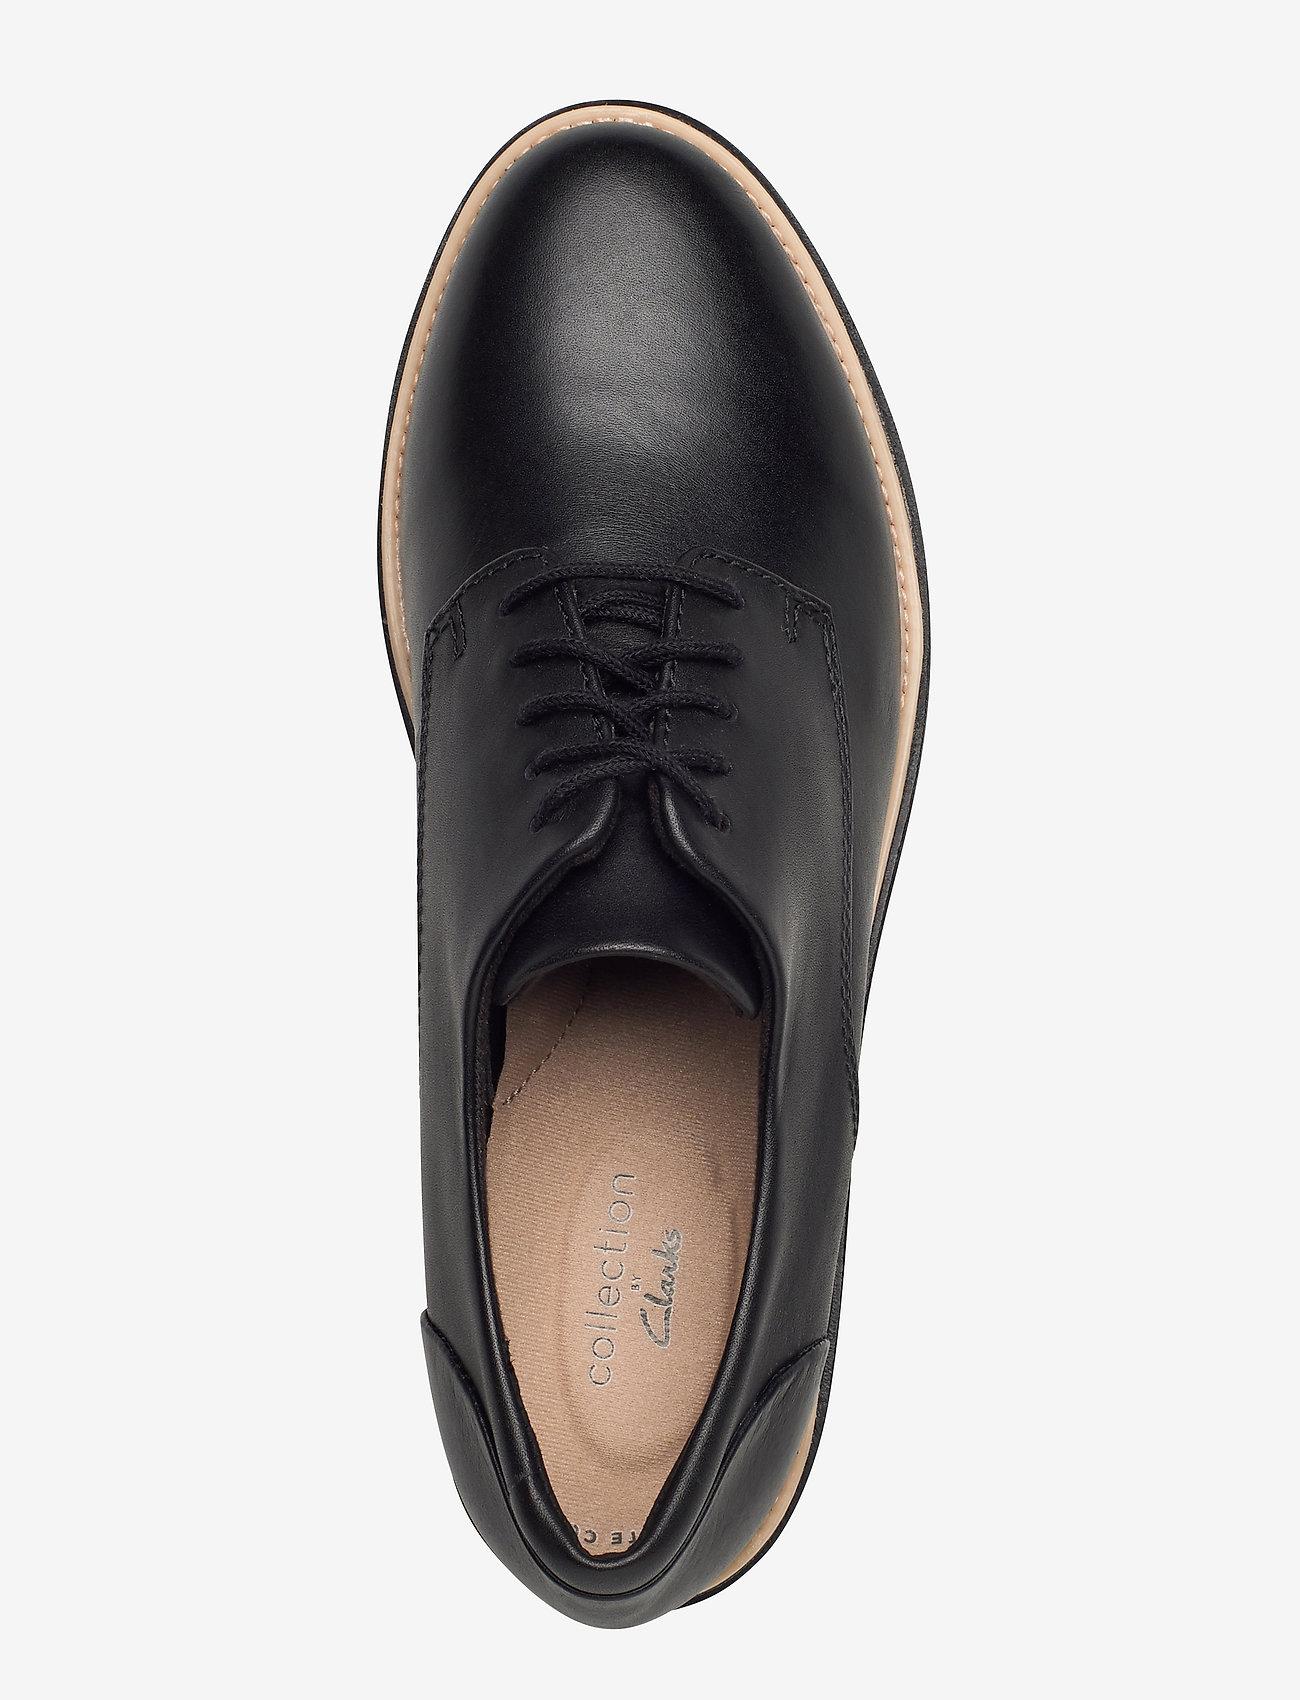 Clarks Sharon Noel - Flache Schuhe BLACK LEATHER - Schuhe Billige